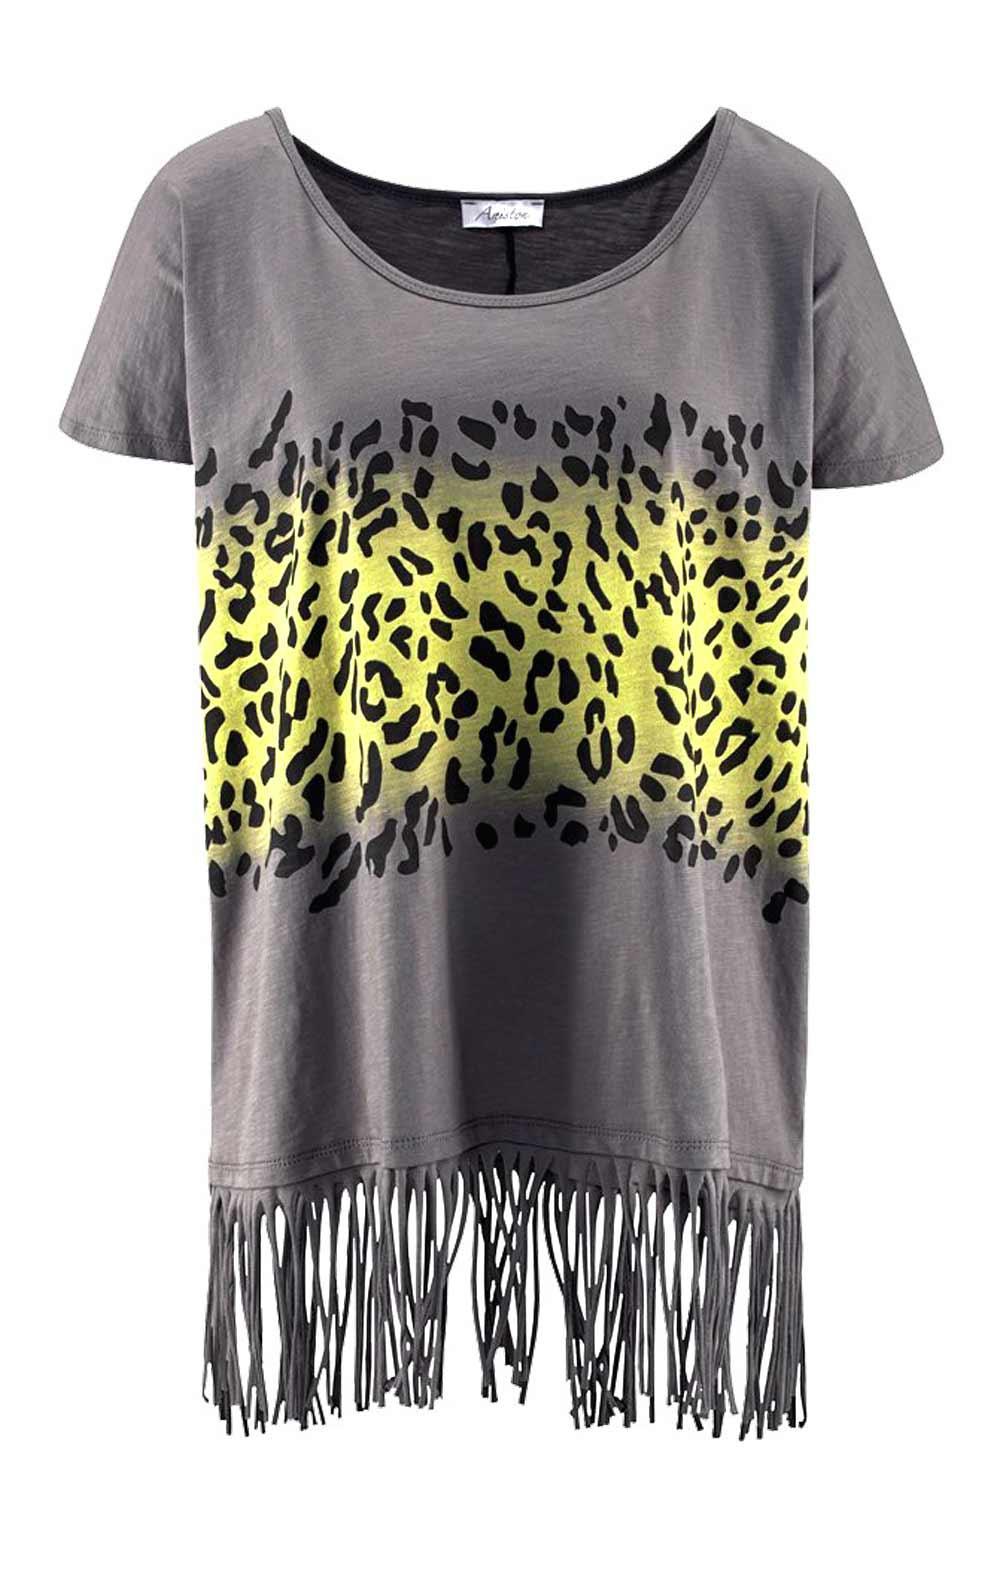 shirt mit fransen grau gelb shirts und tops outlet mode shop. Black Bedroom Furniture Sets. Home Design Ideas